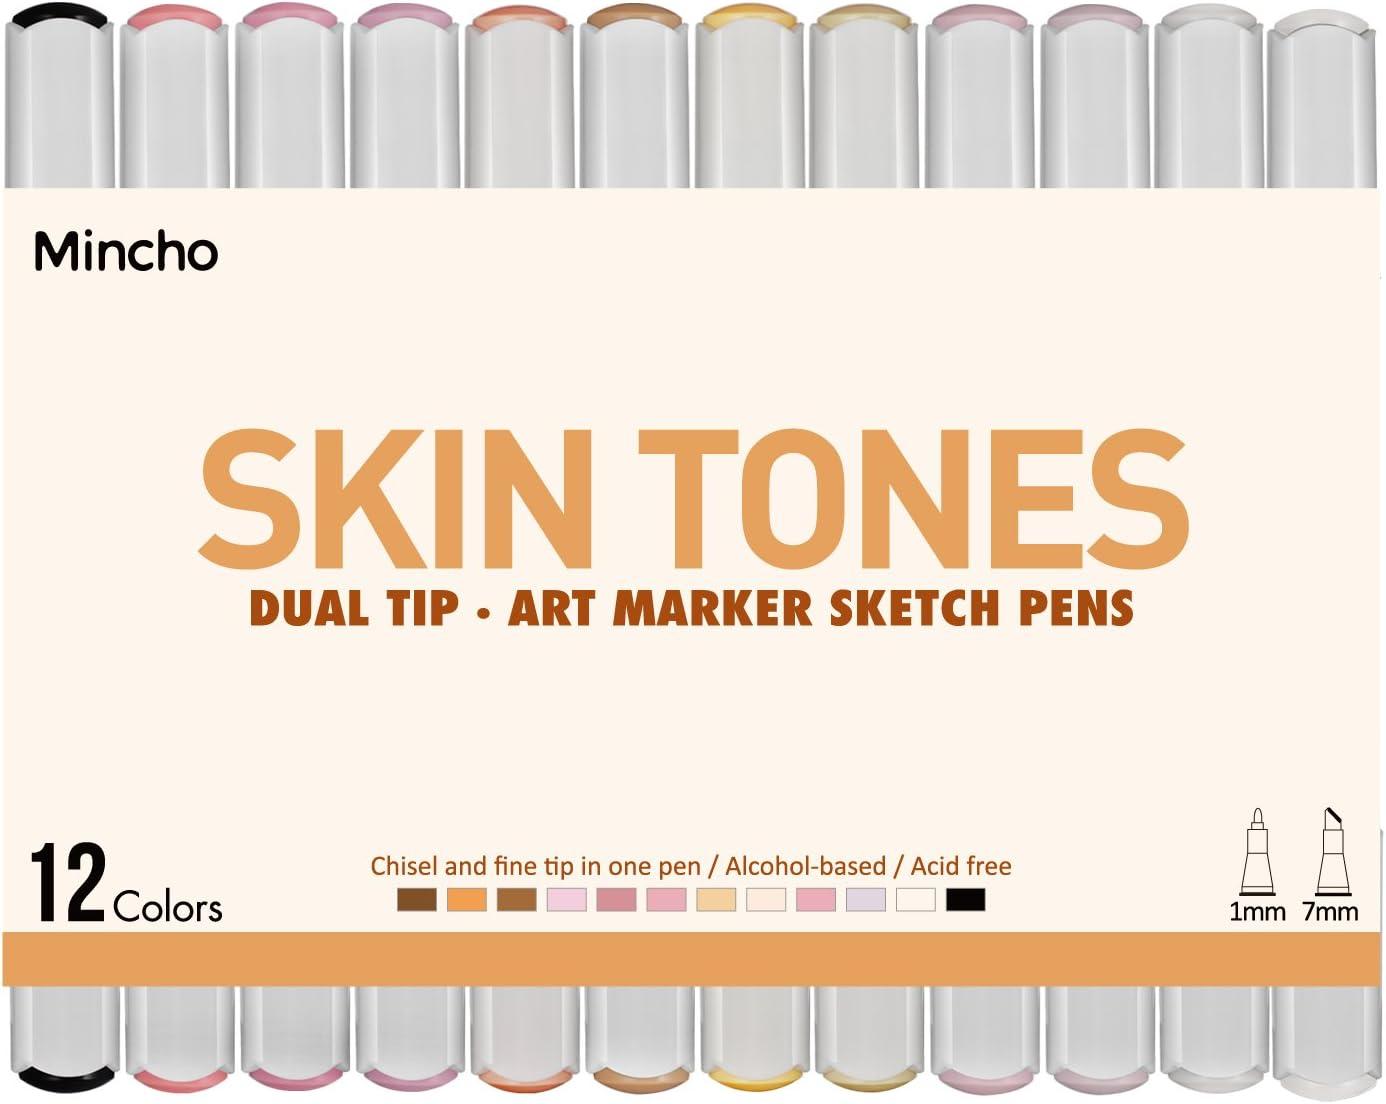 2Pcs Flesh Light Color Watercolor Pencils Skin Tone Lead Core Pencil for Portrait Comic Adult Coloring Books Artist Coloring Drawing Sketching/Blending